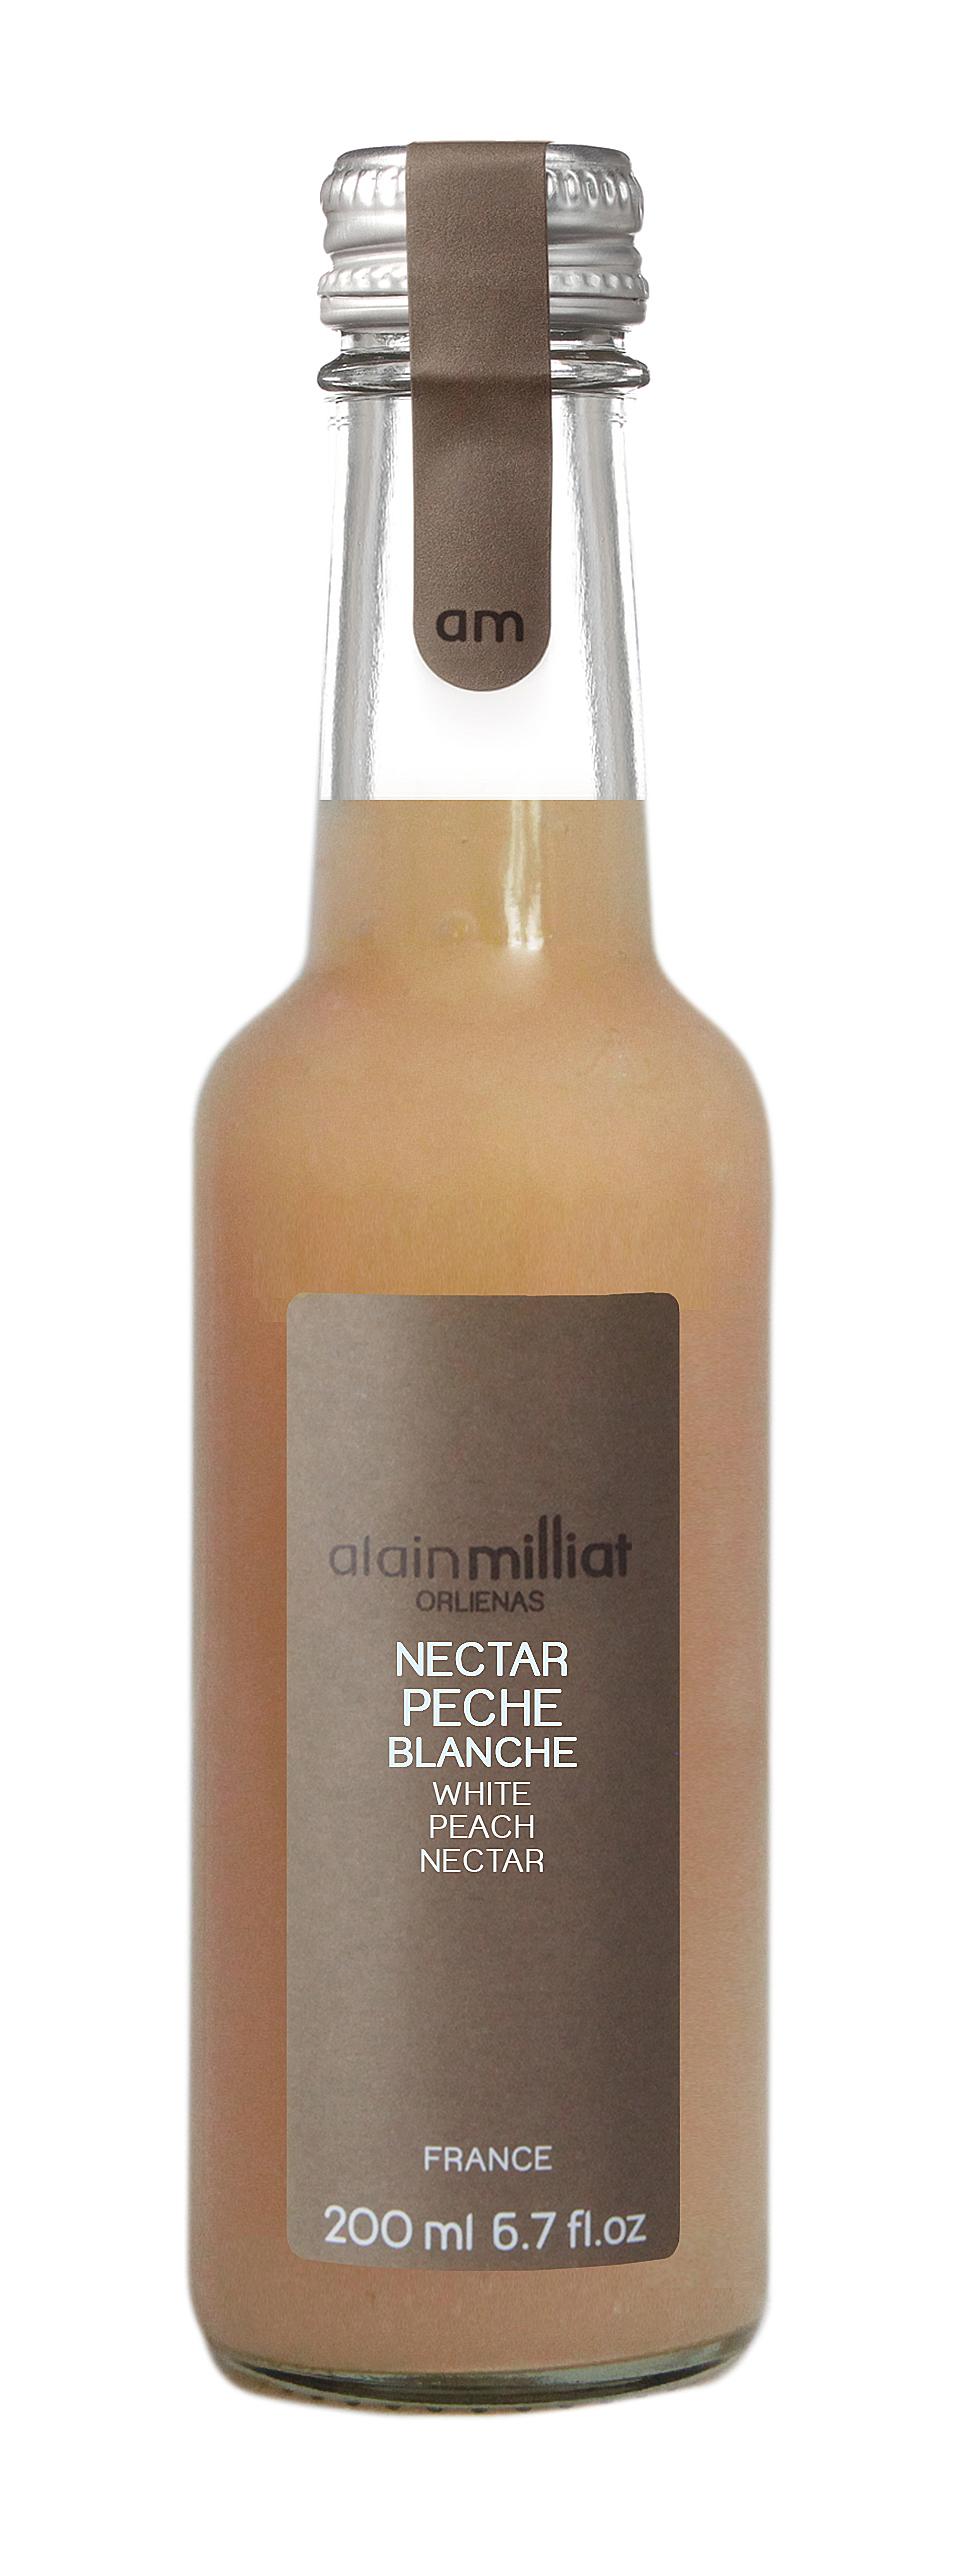 Nectar Pêche Blanche, Alain Milliat (20 cl)